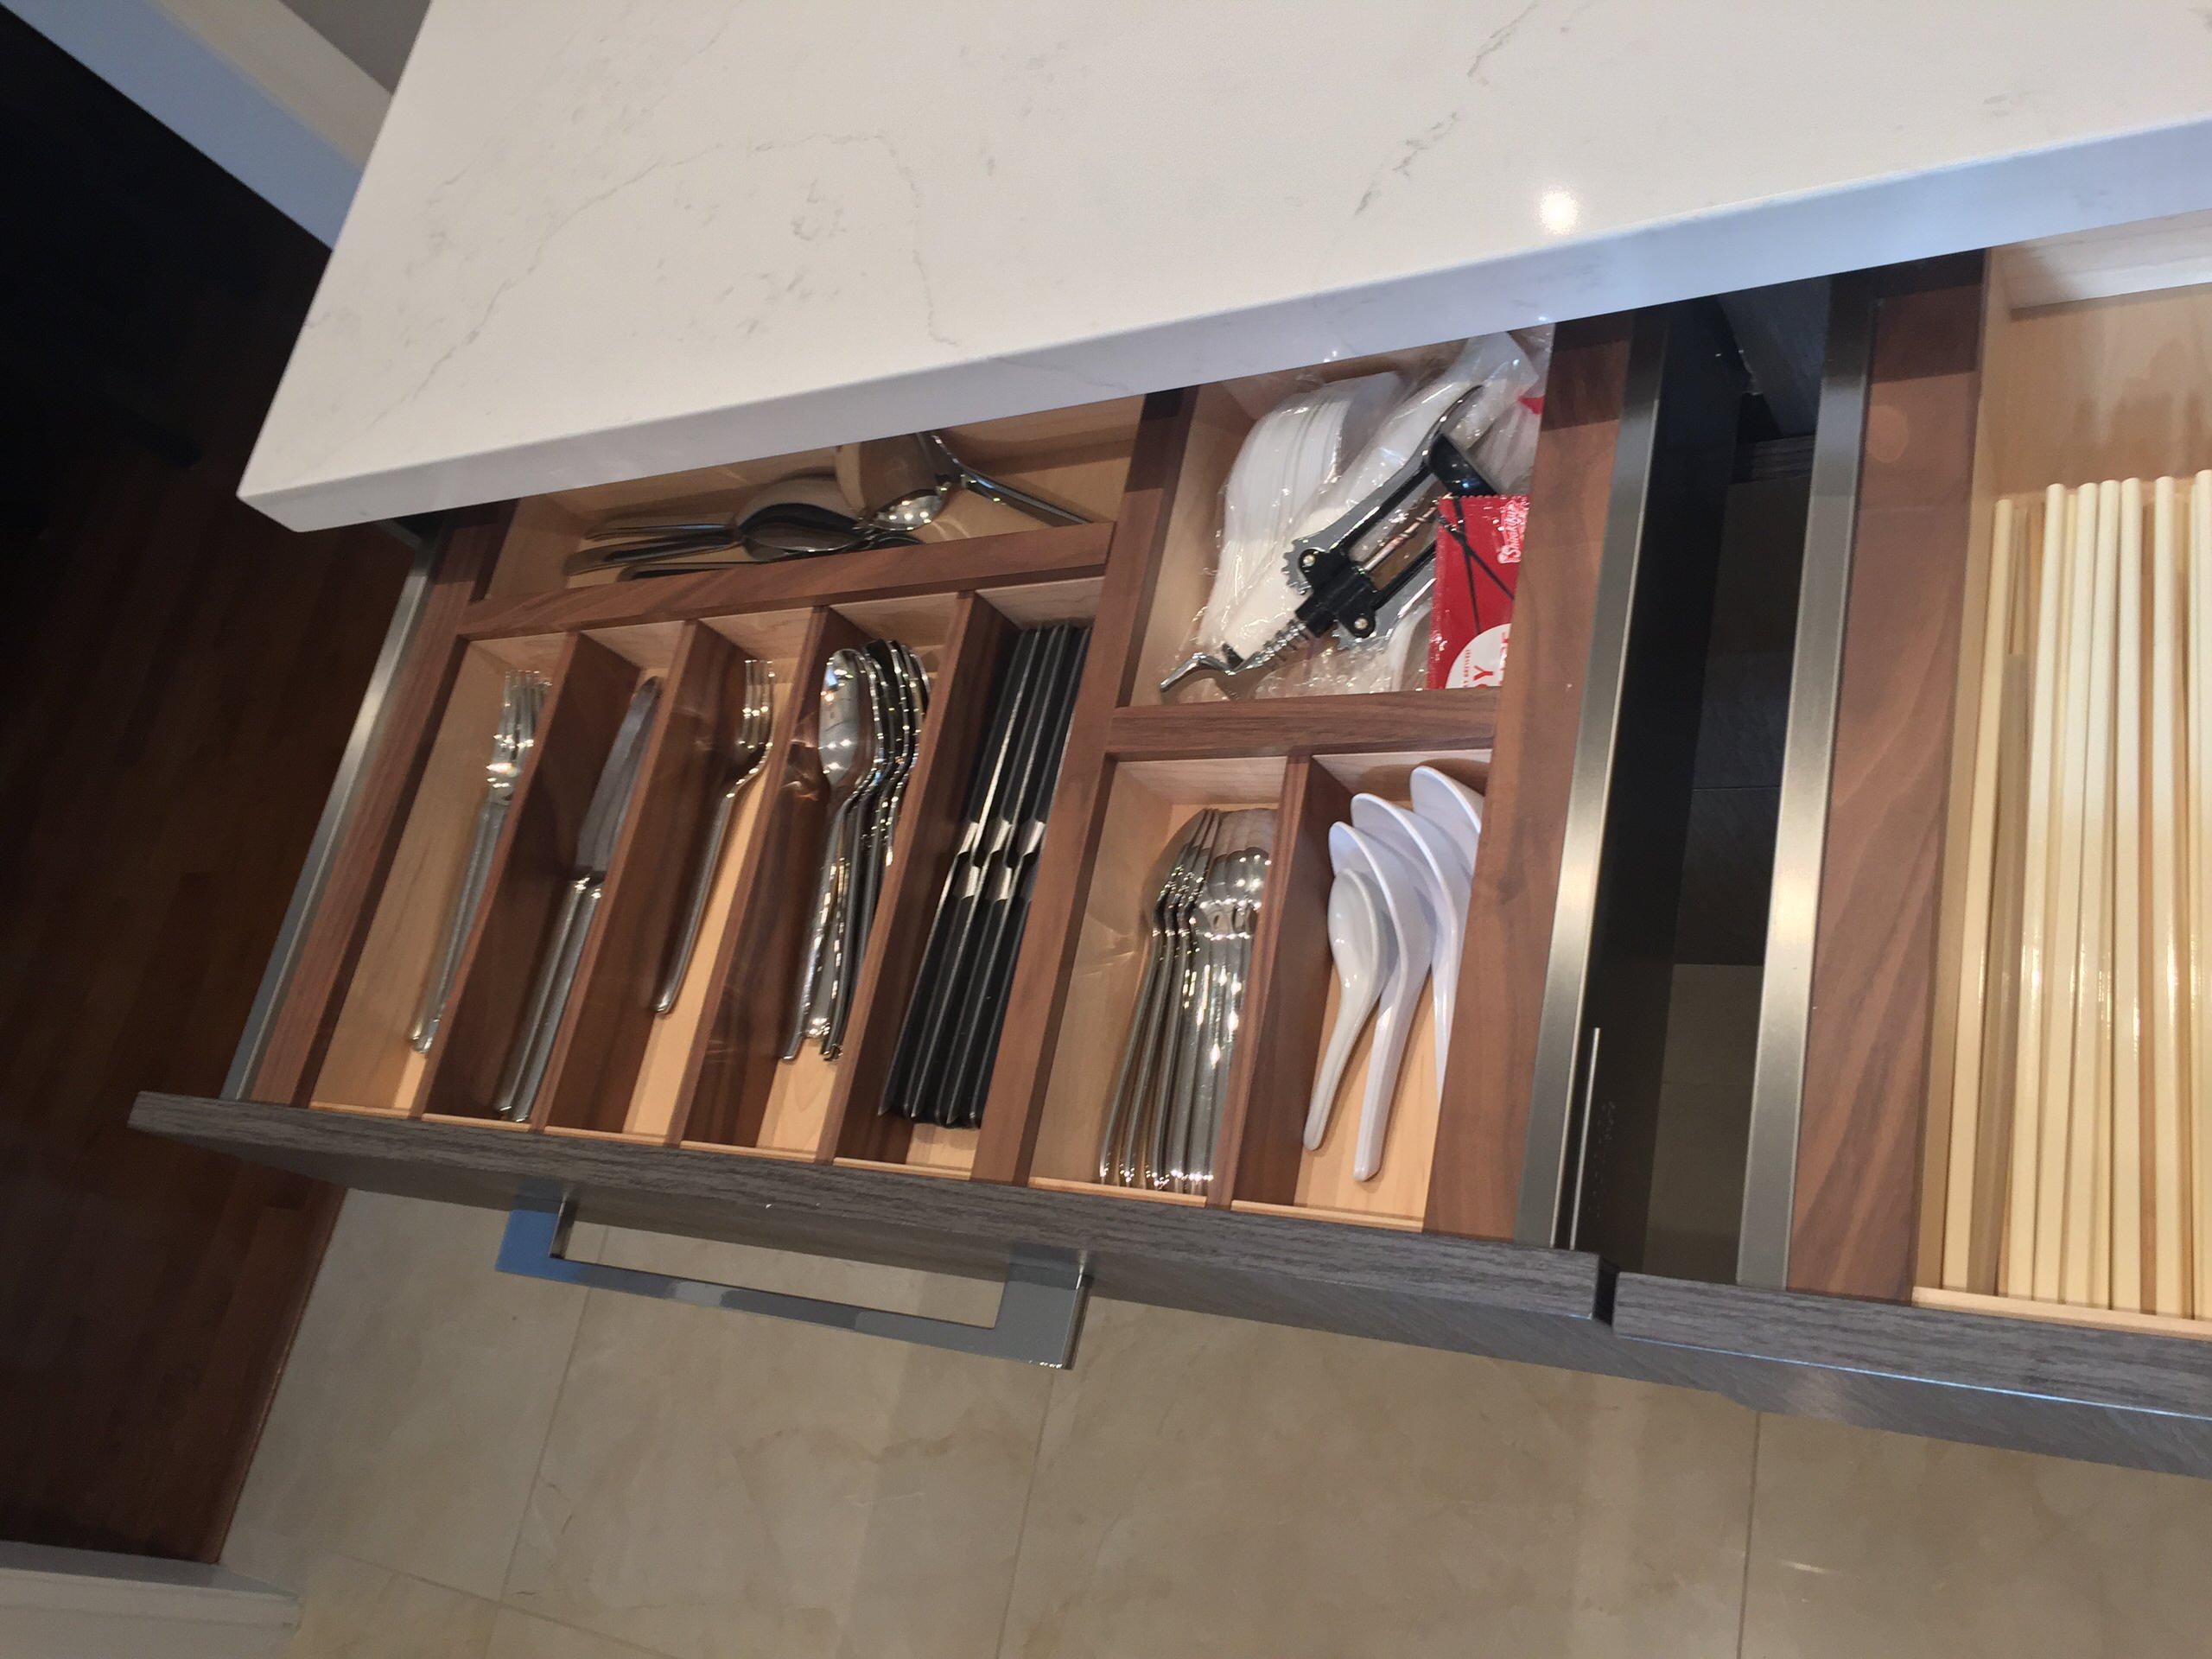 customized utensil dividers